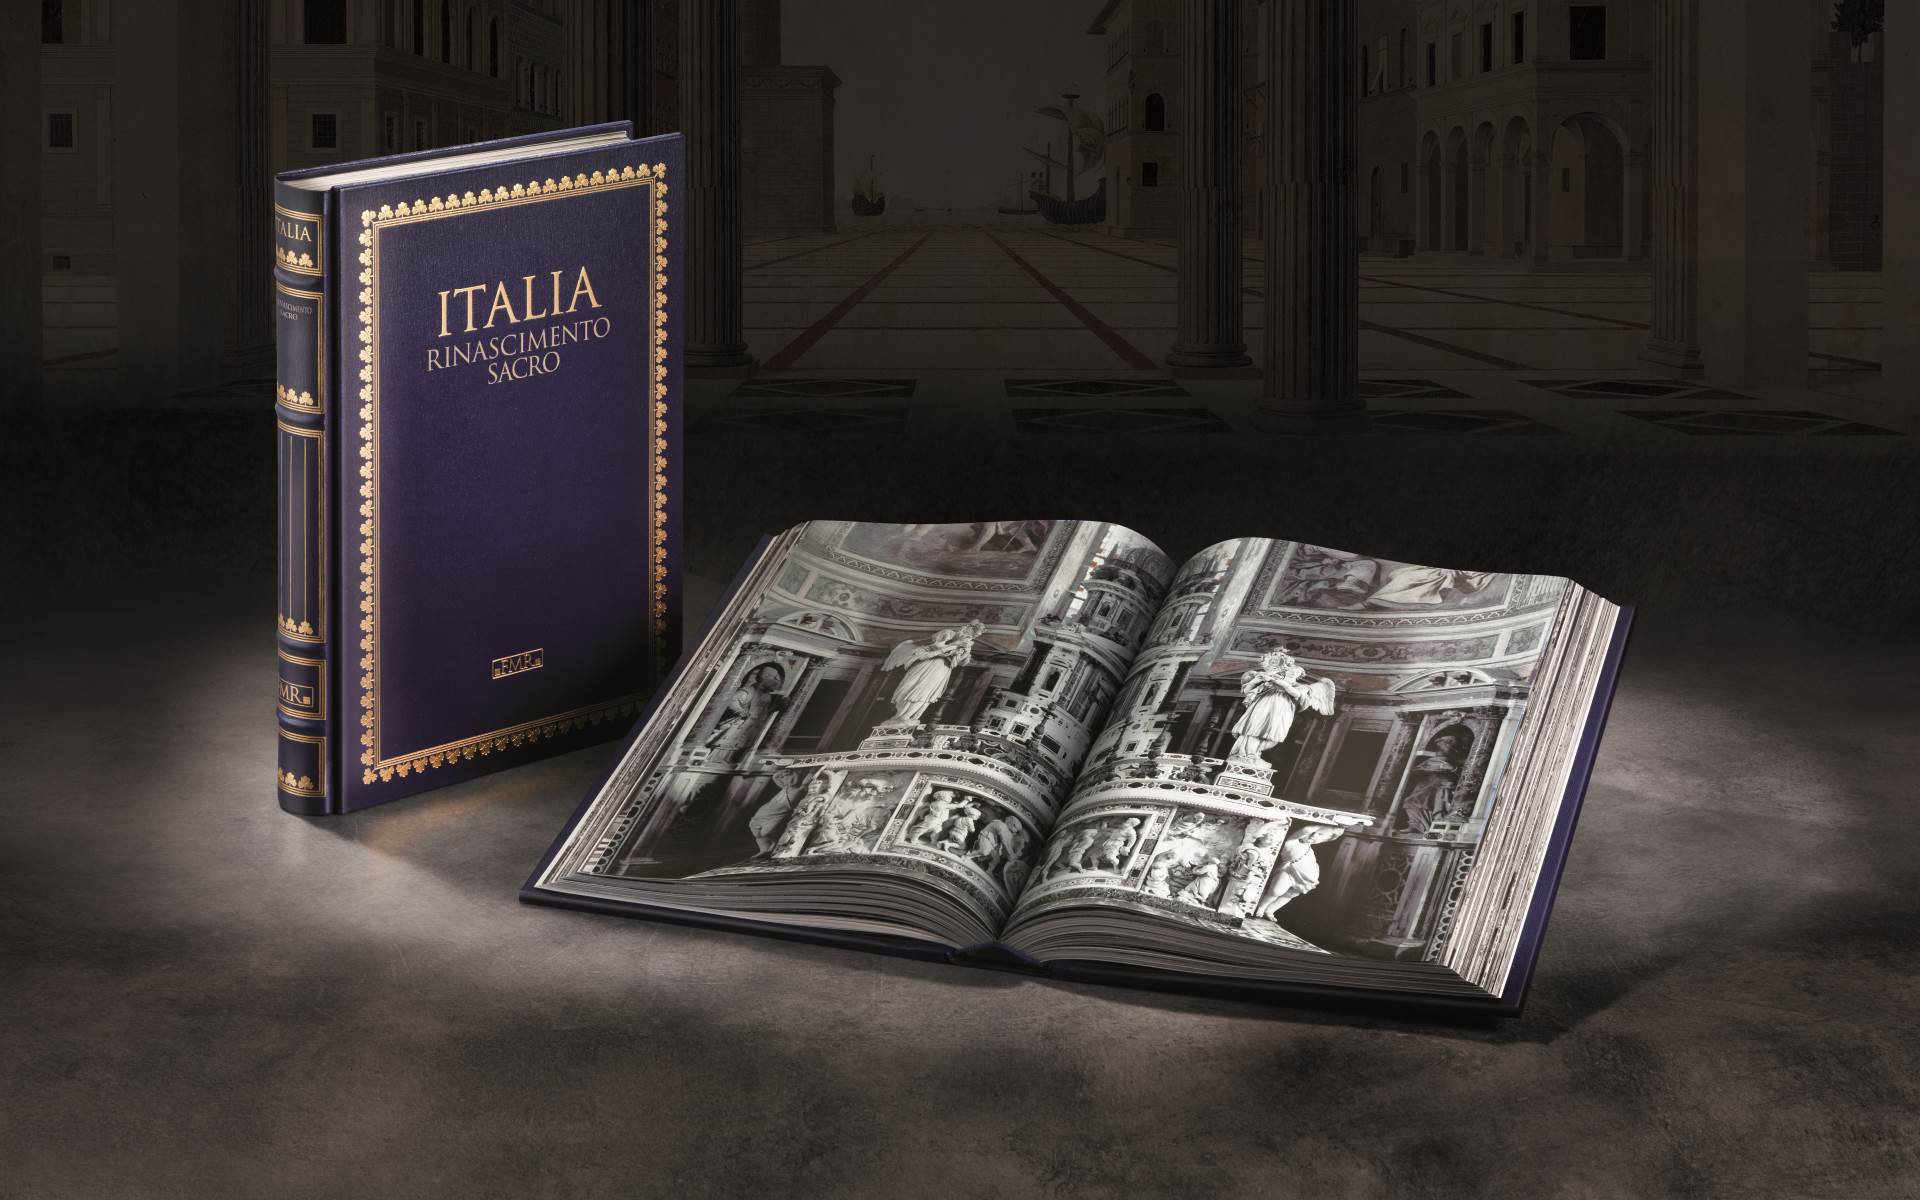 Italia-Rinascimento-Sacro